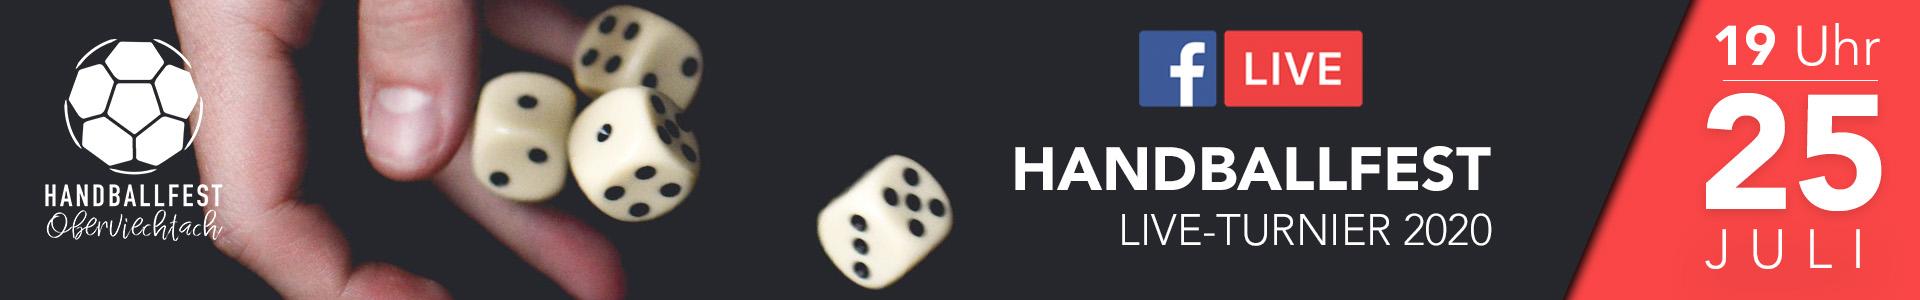 Live-Turnier-website-banner